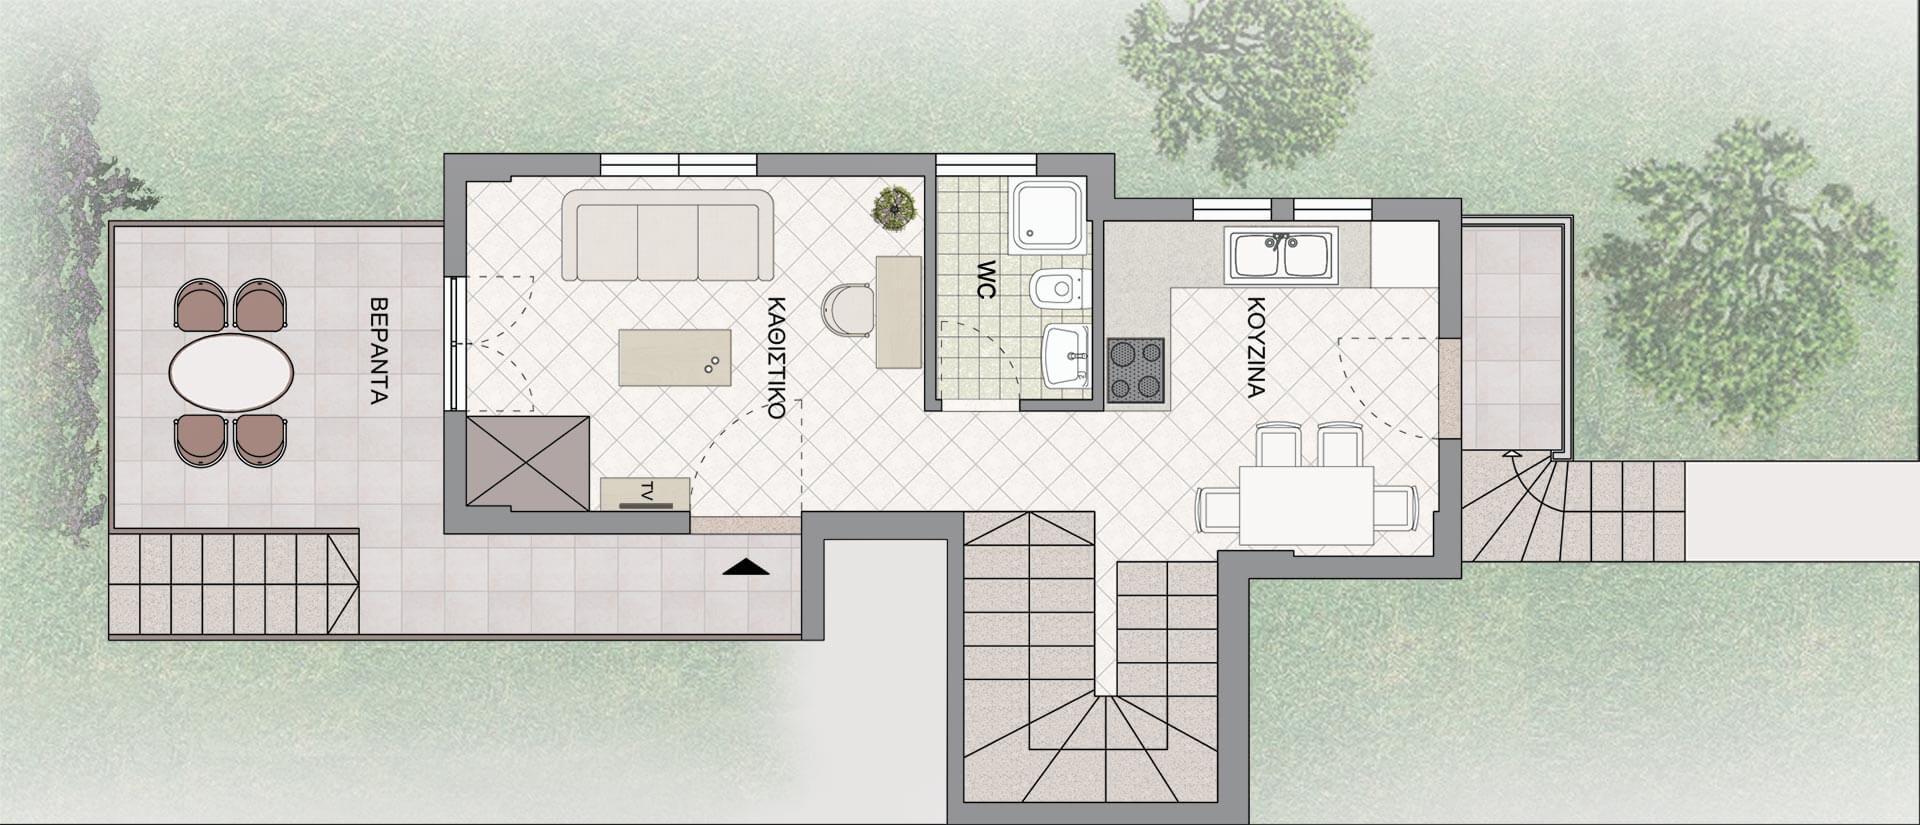 atmosfaira_layout